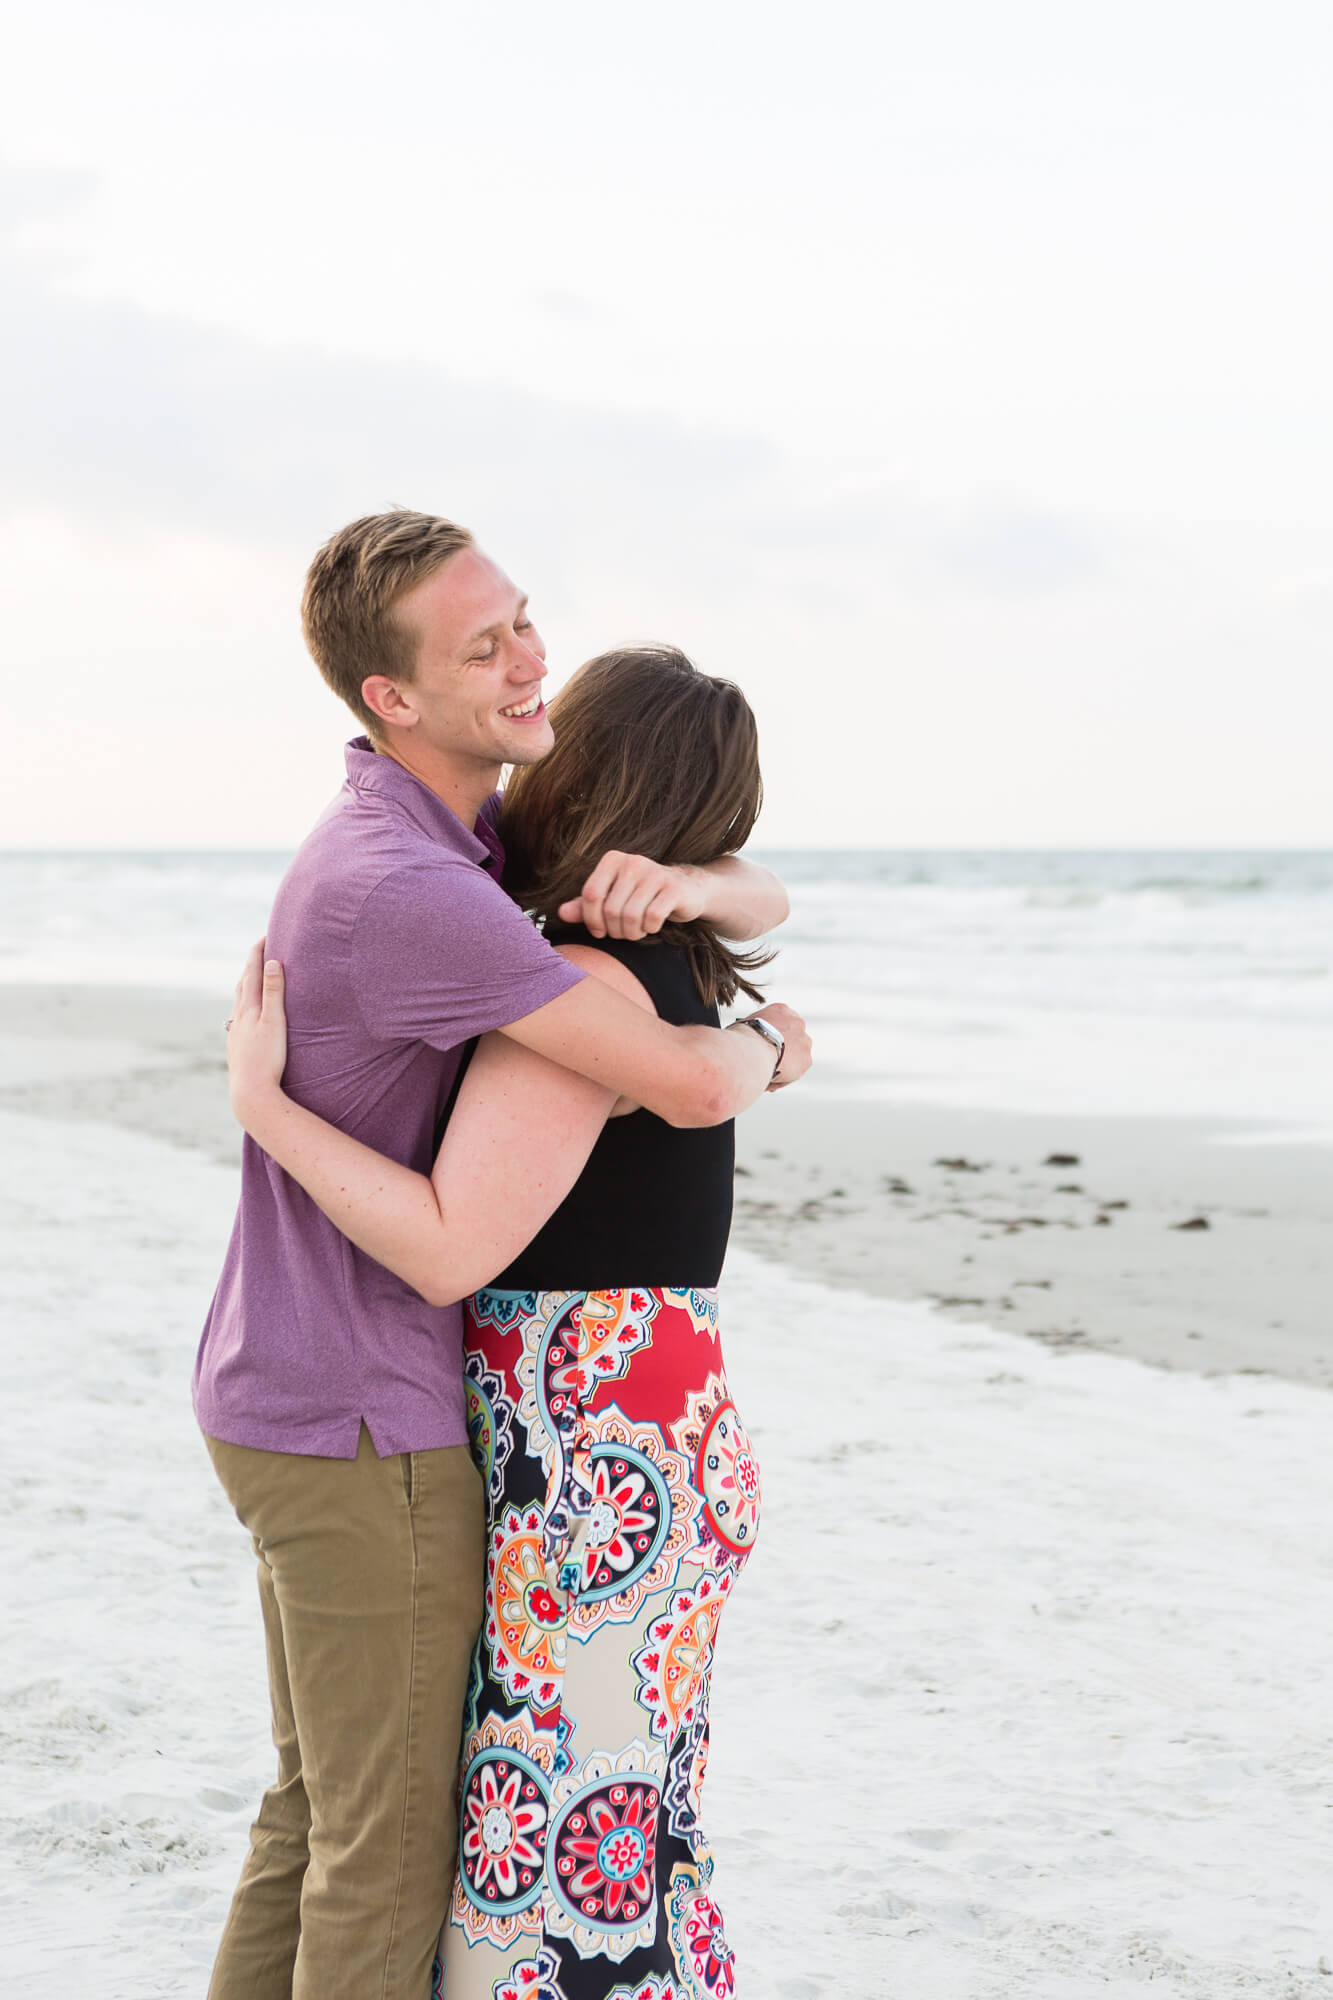 Joe proposing to Emily on Florida's New Smyrna Beach